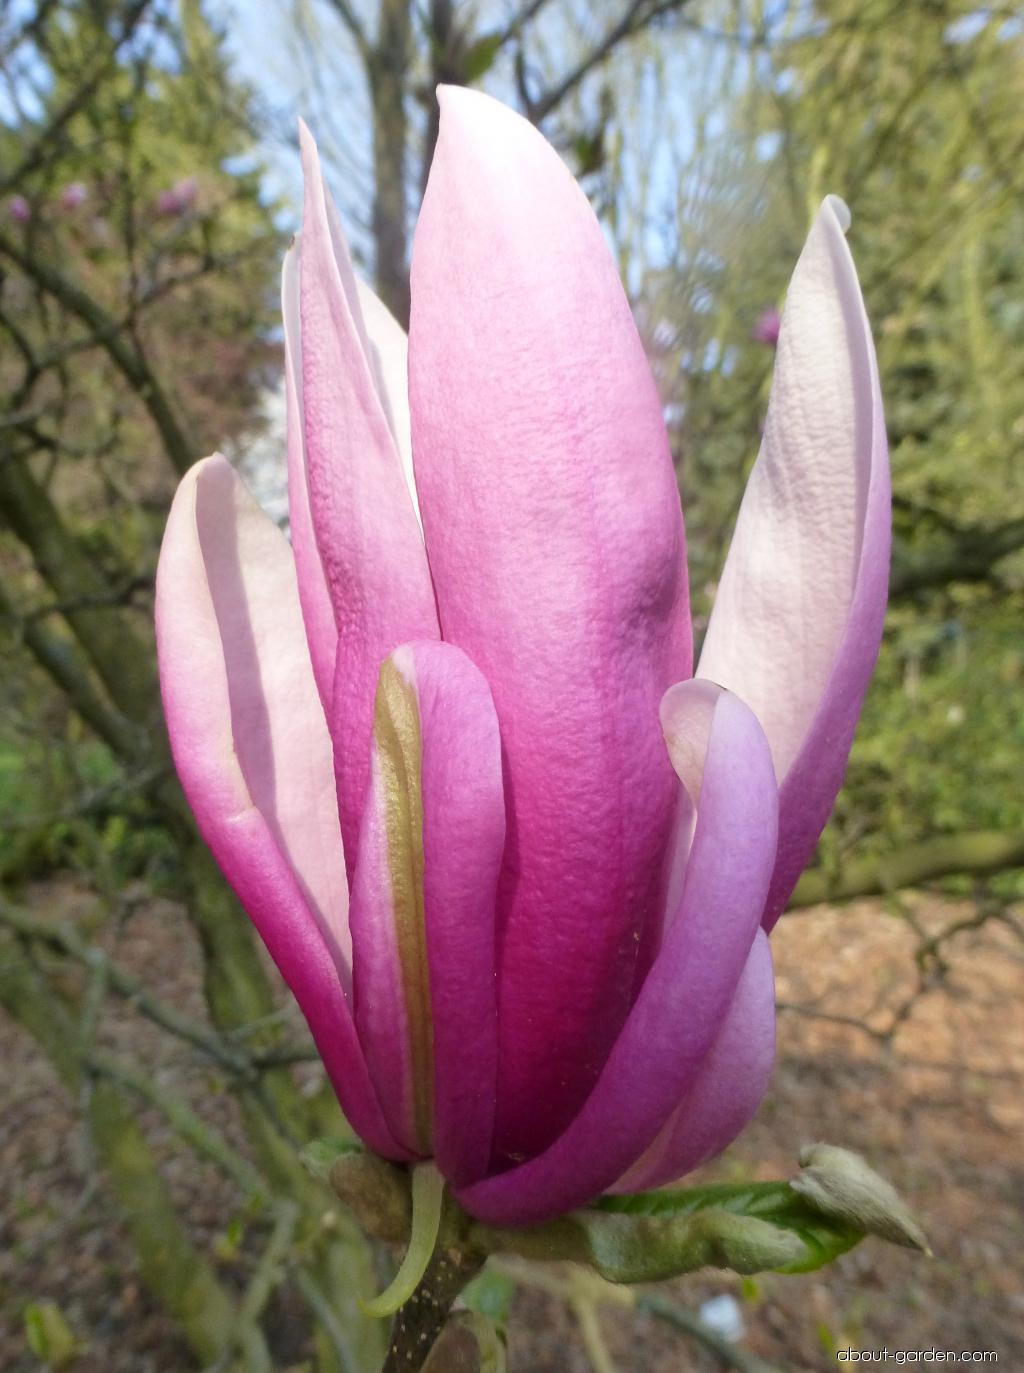 Magnolia - Magnolia Susan